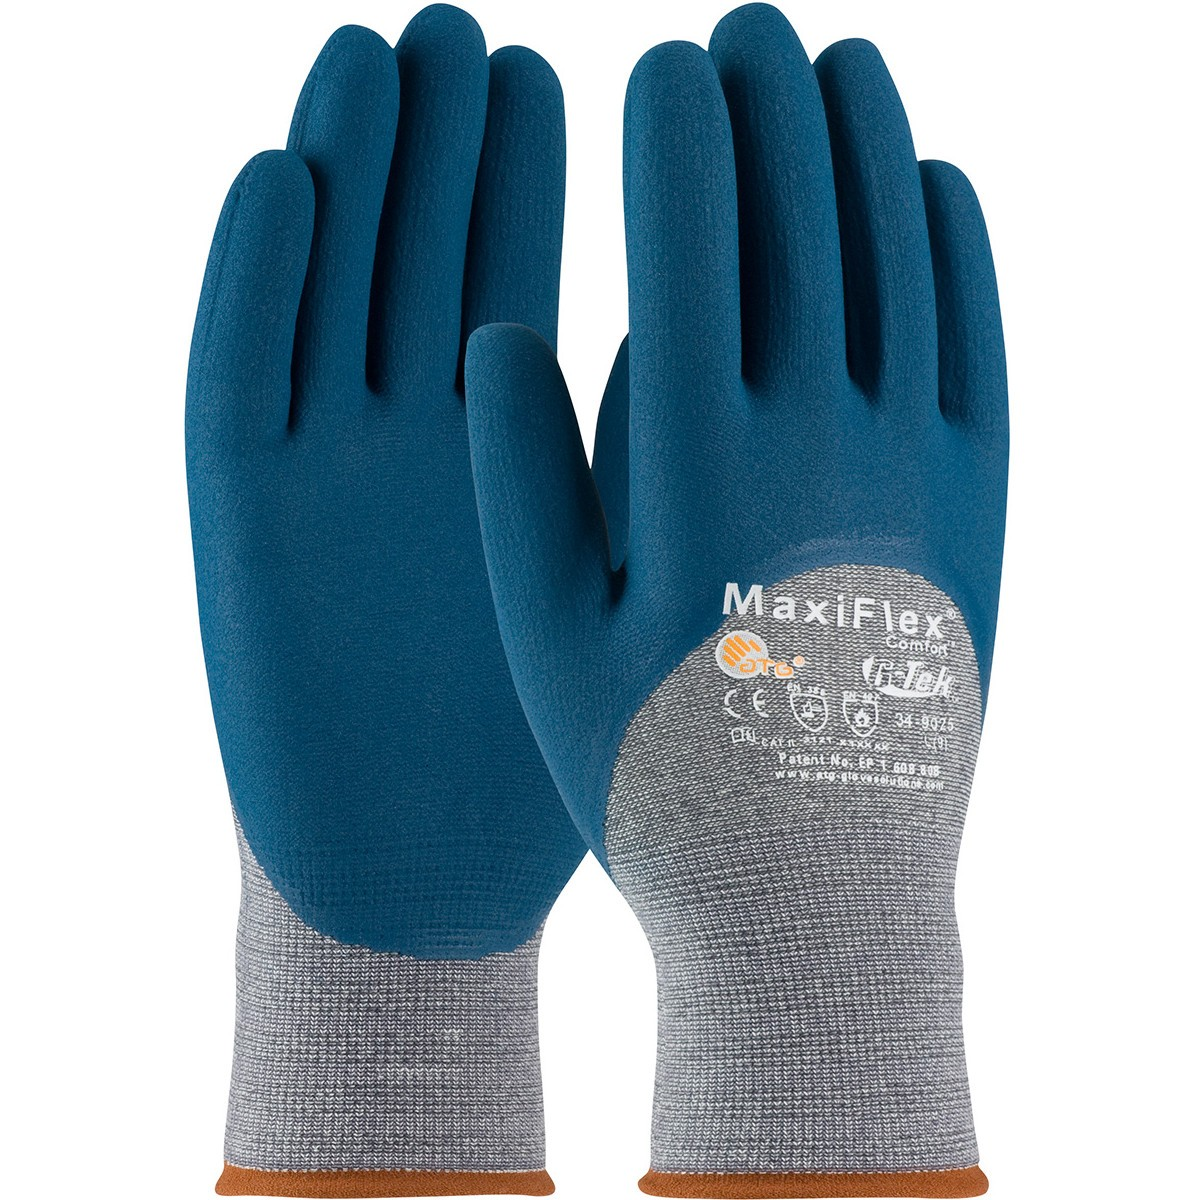 Pip 34 9025 Maxiflex Comfort Seamless Knit Cotton Nylon